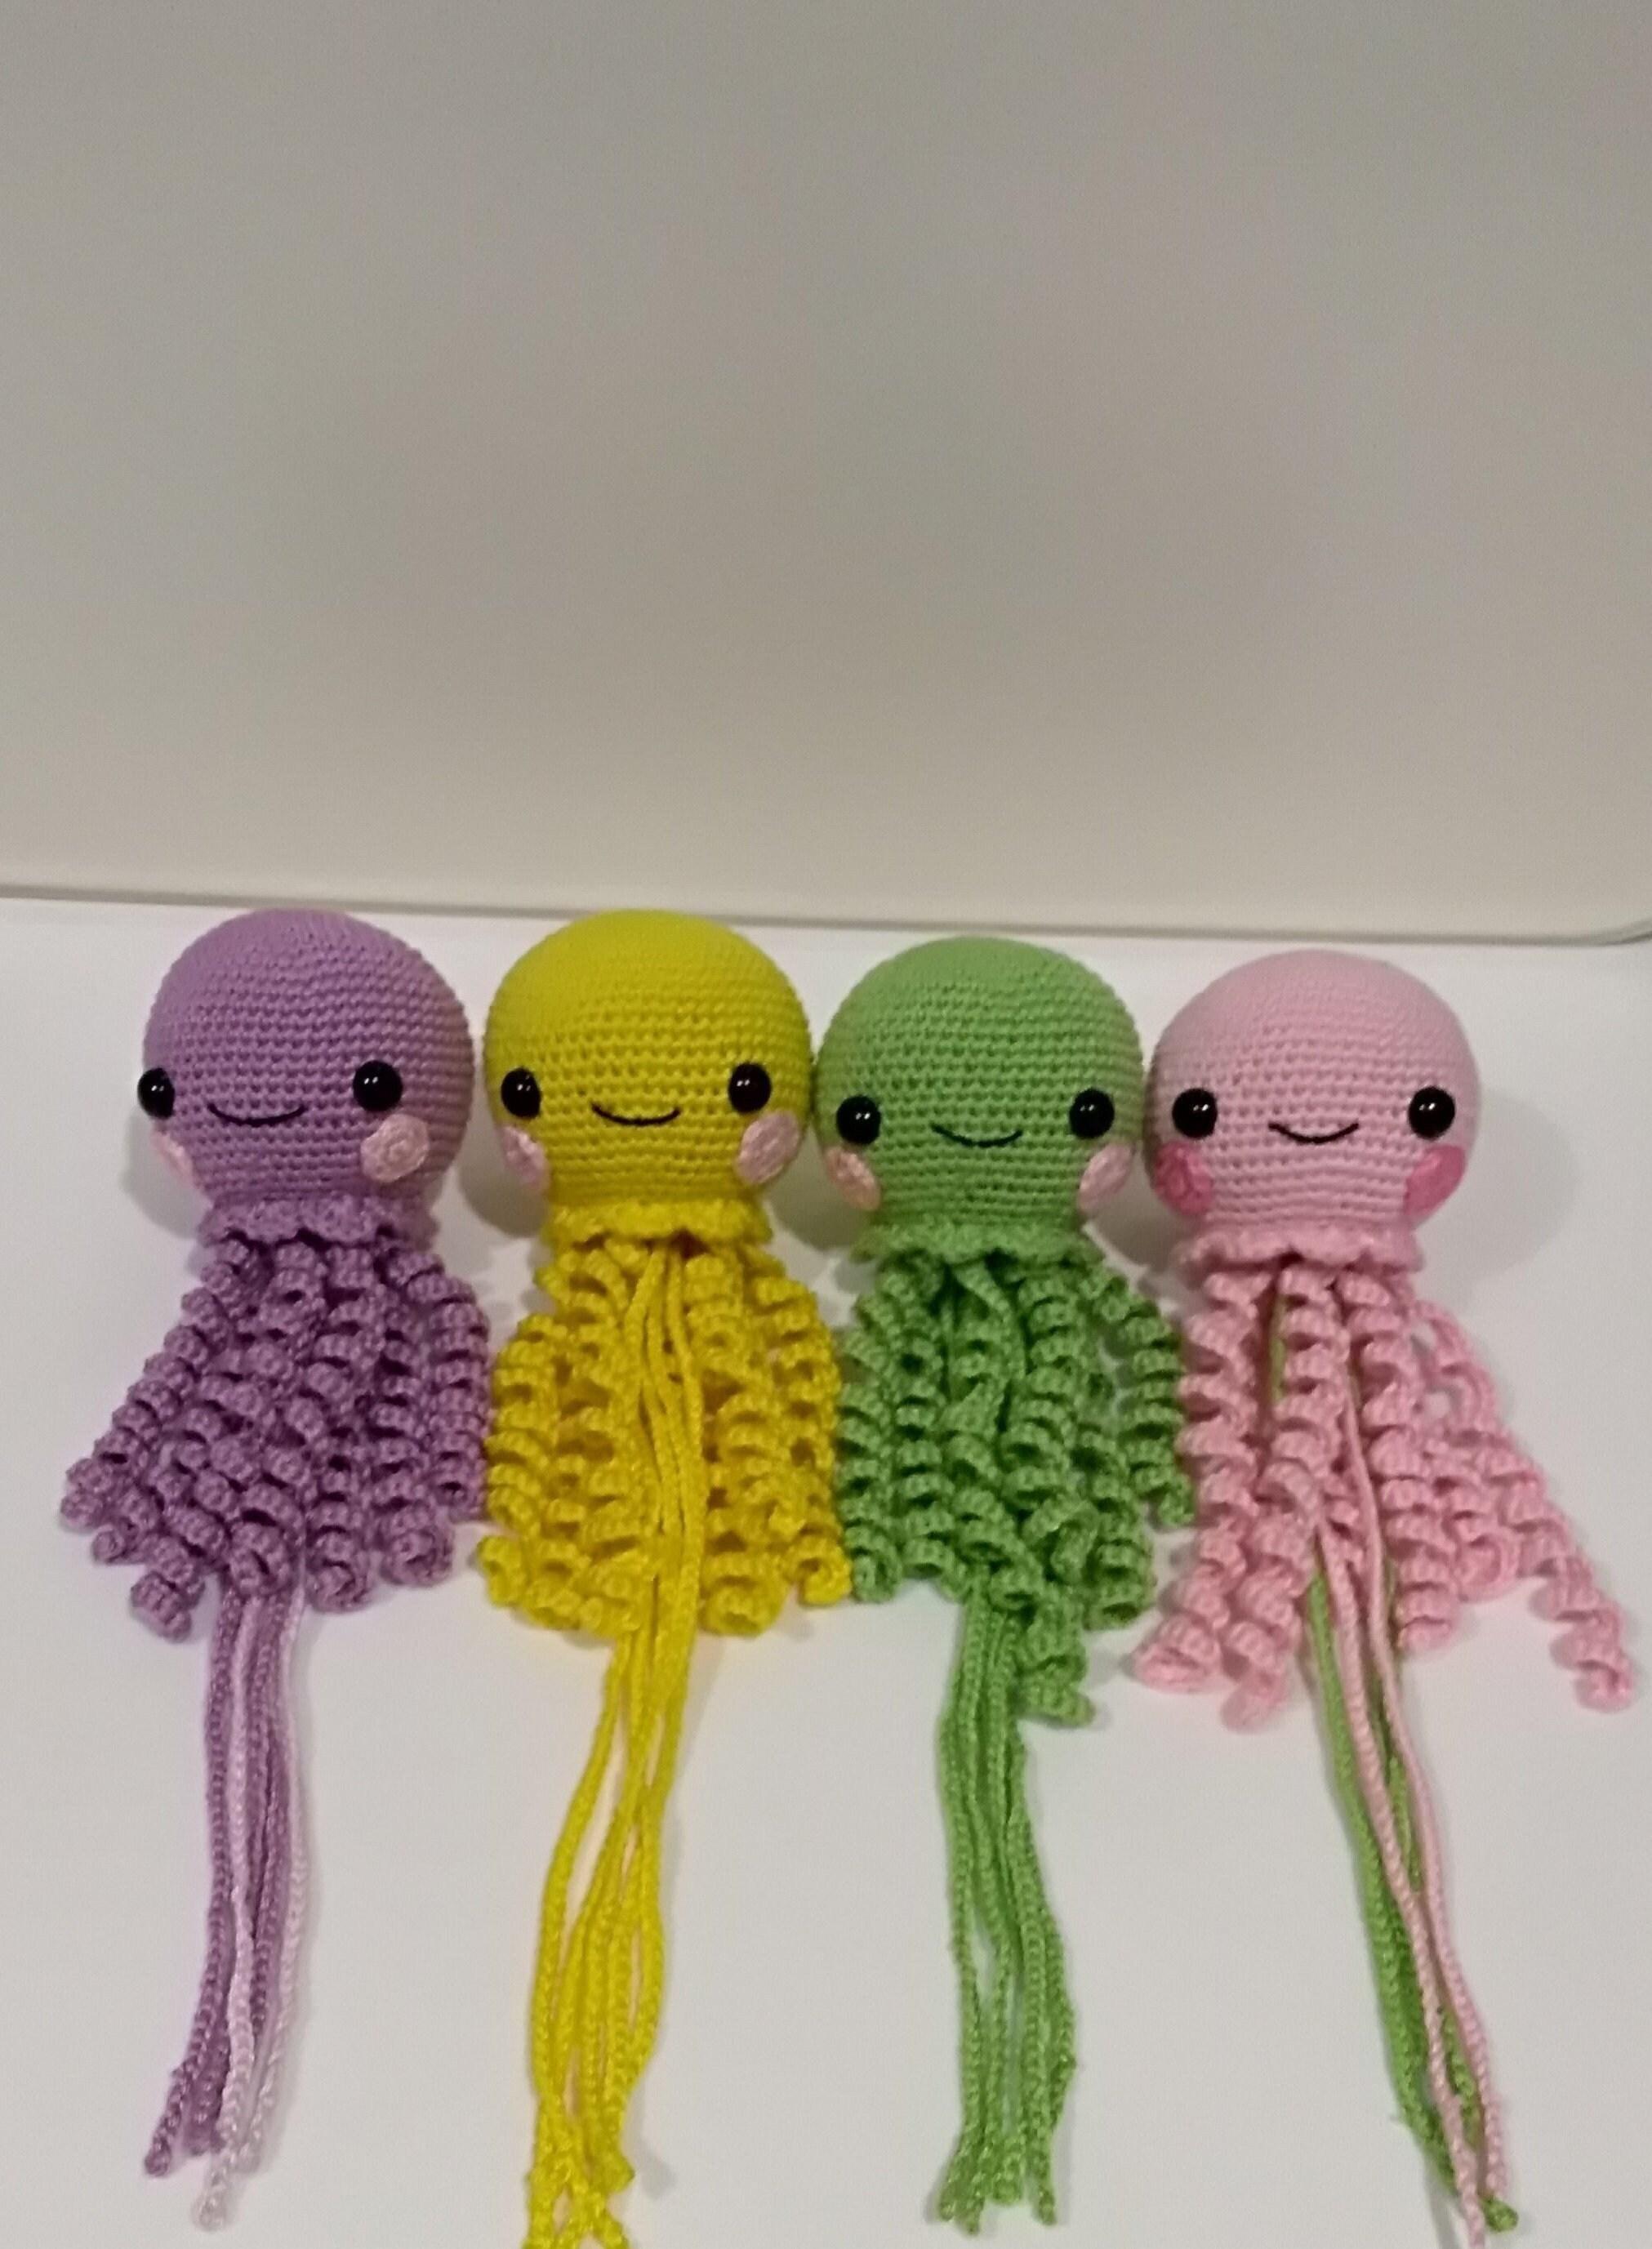 Cute Crochet Octopus Toy For Preemie Crochet Jellyfish Toy Etsy